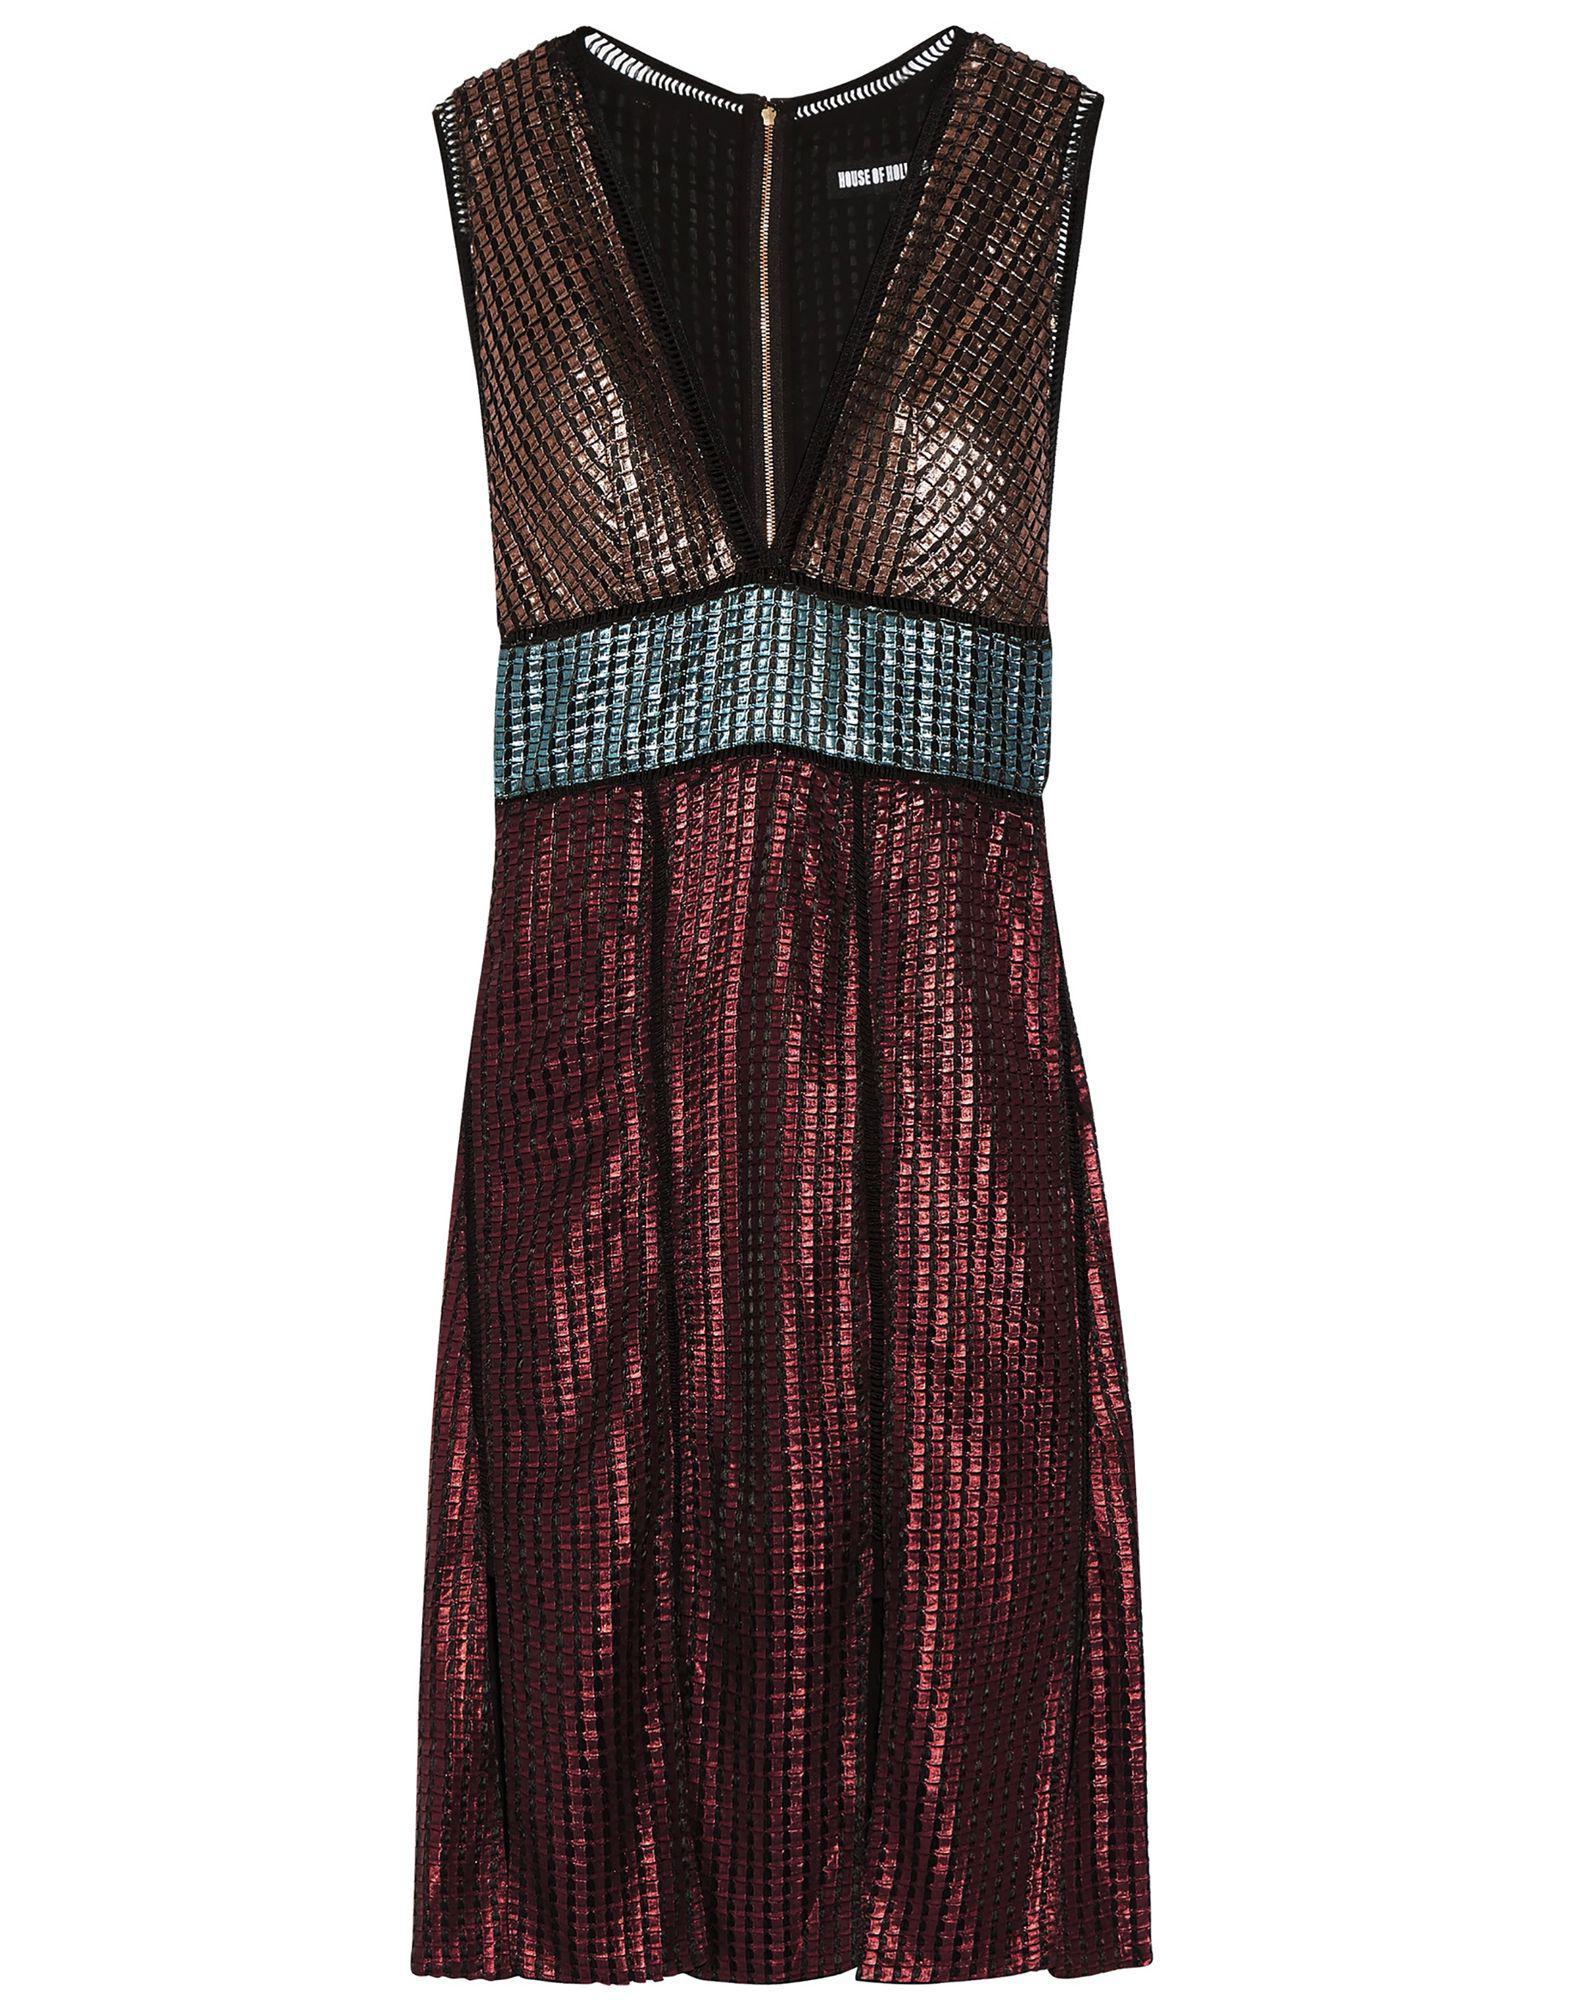 House of Holland Knee-length Dress - Lyst dceffe820